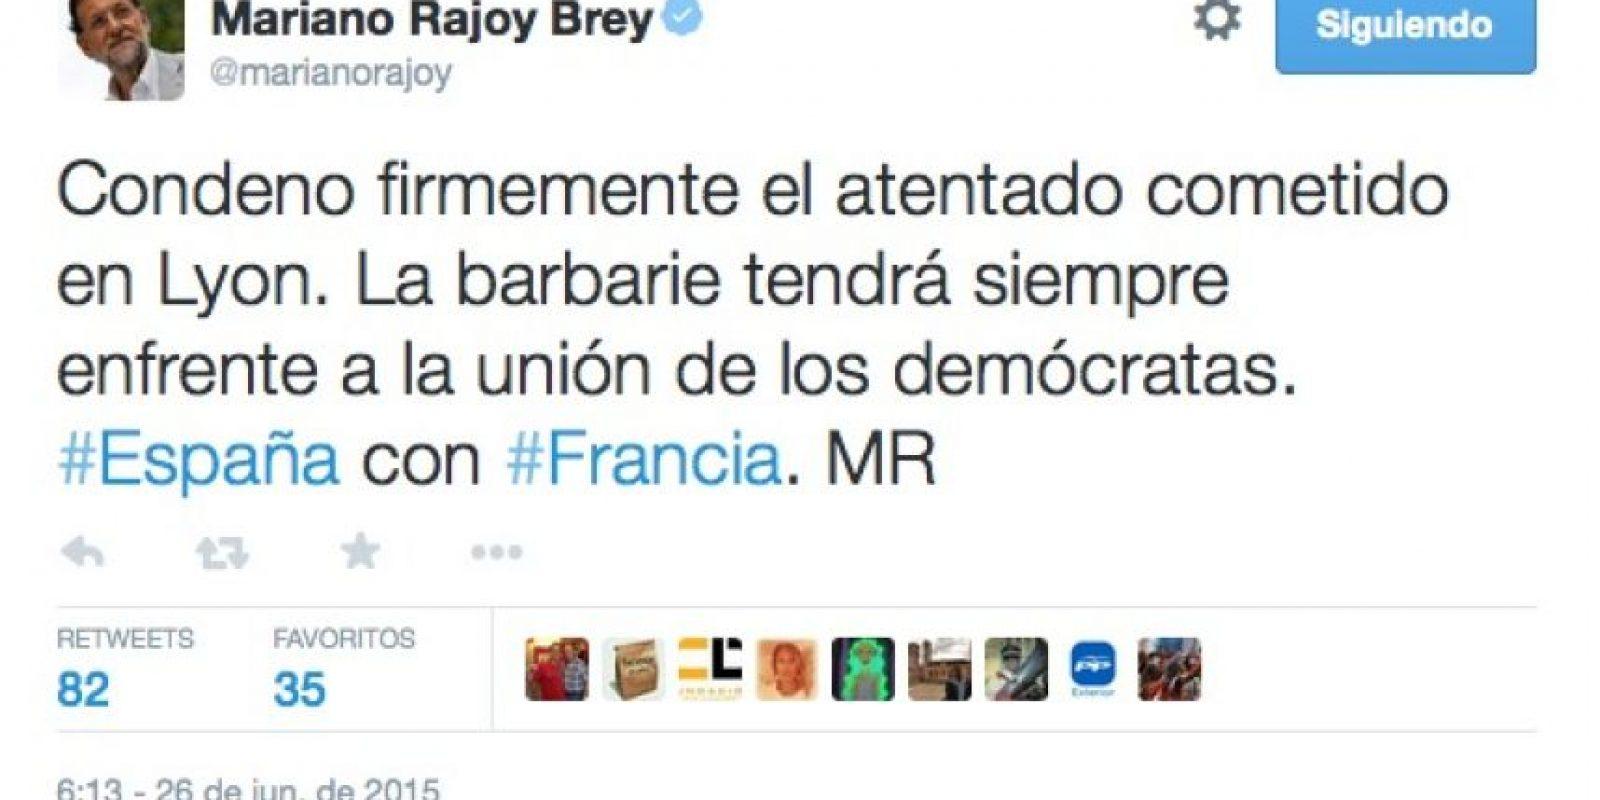 Mariano Rajoy, presidente del gobierno español Foto:Twitter.com